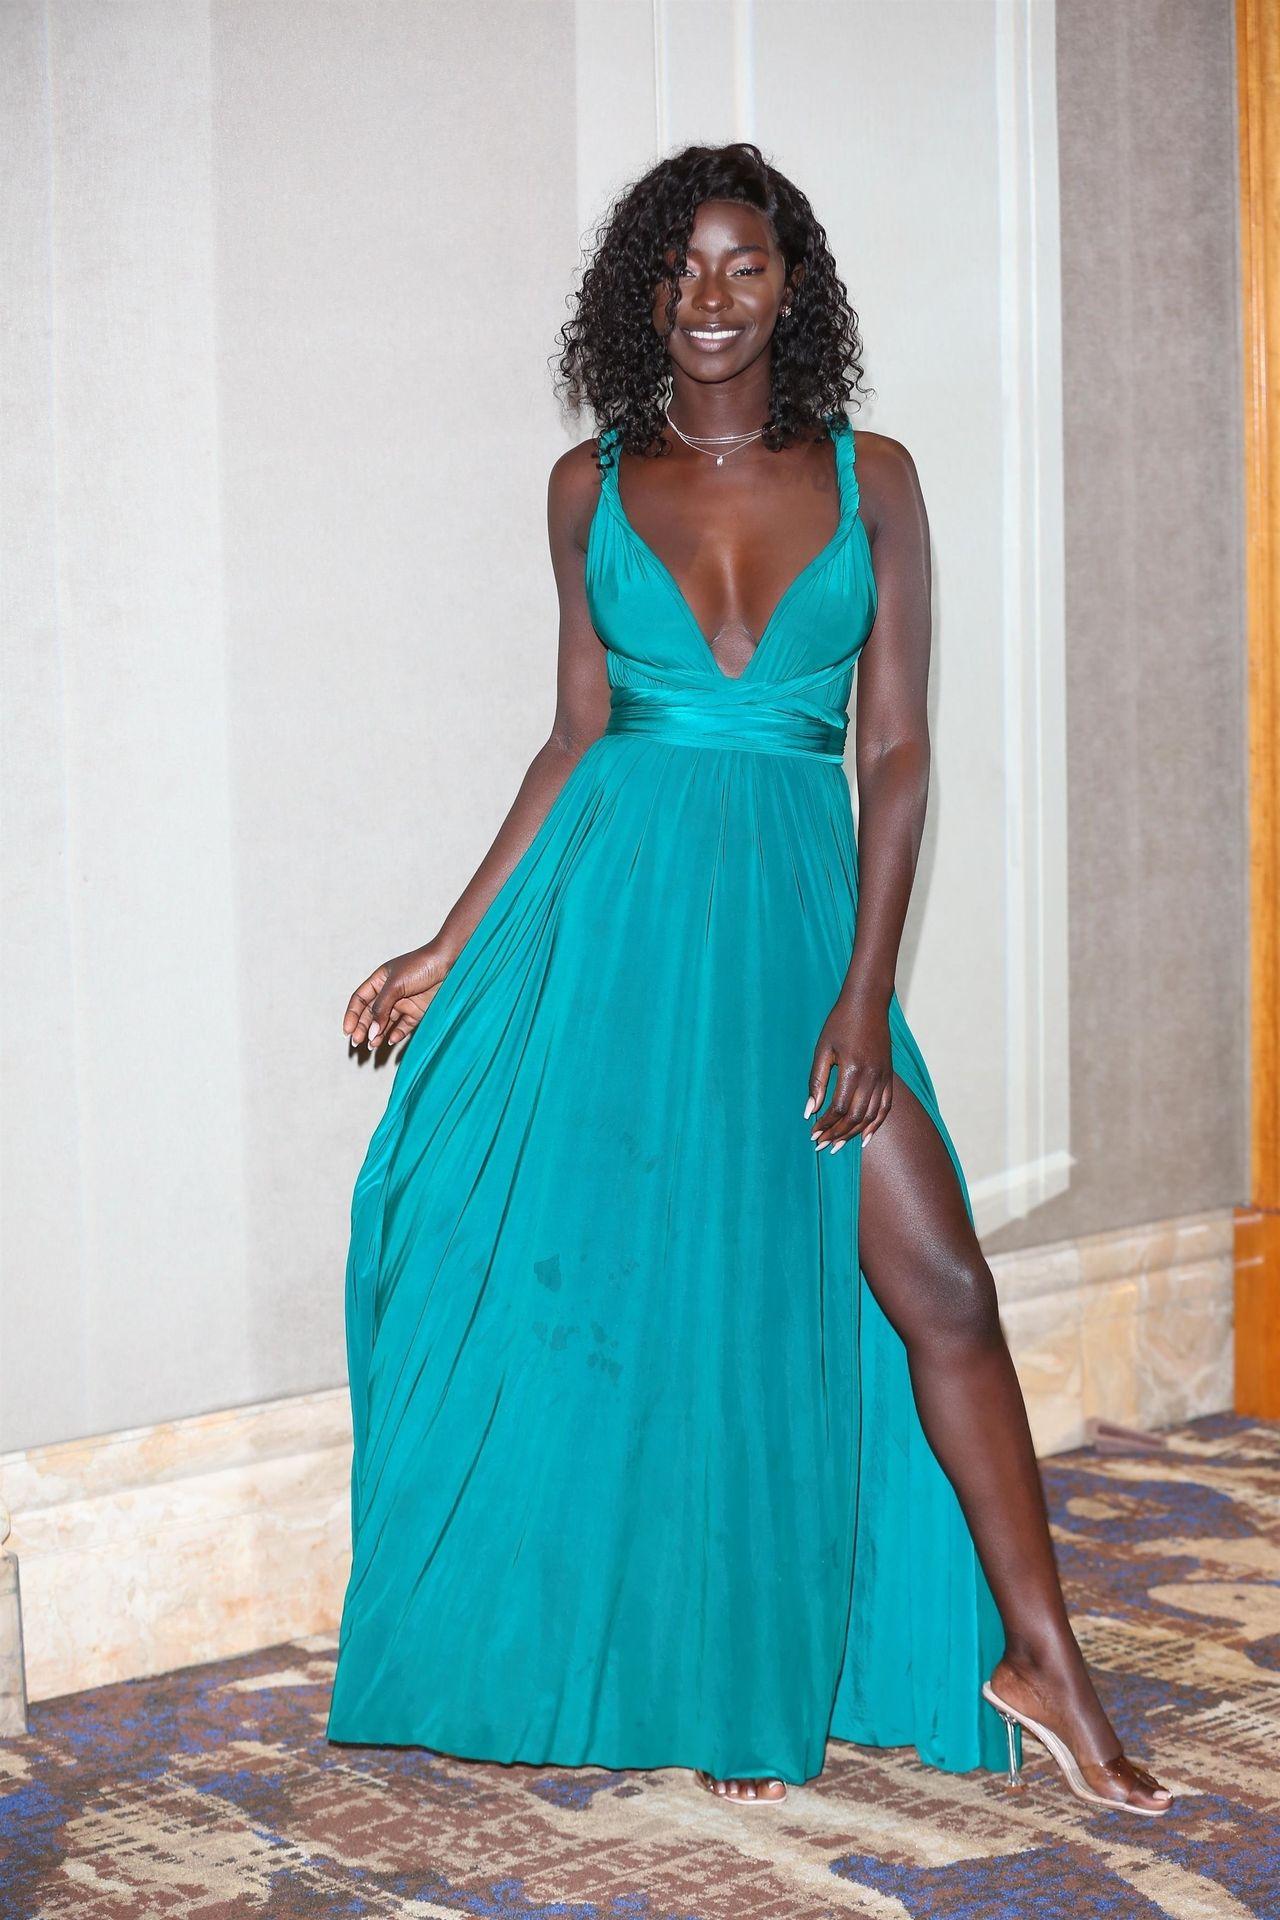 Mike Boateng & Priscilla Anyabu Are Seen At British Ethnic Diversity Sports Awards 0148